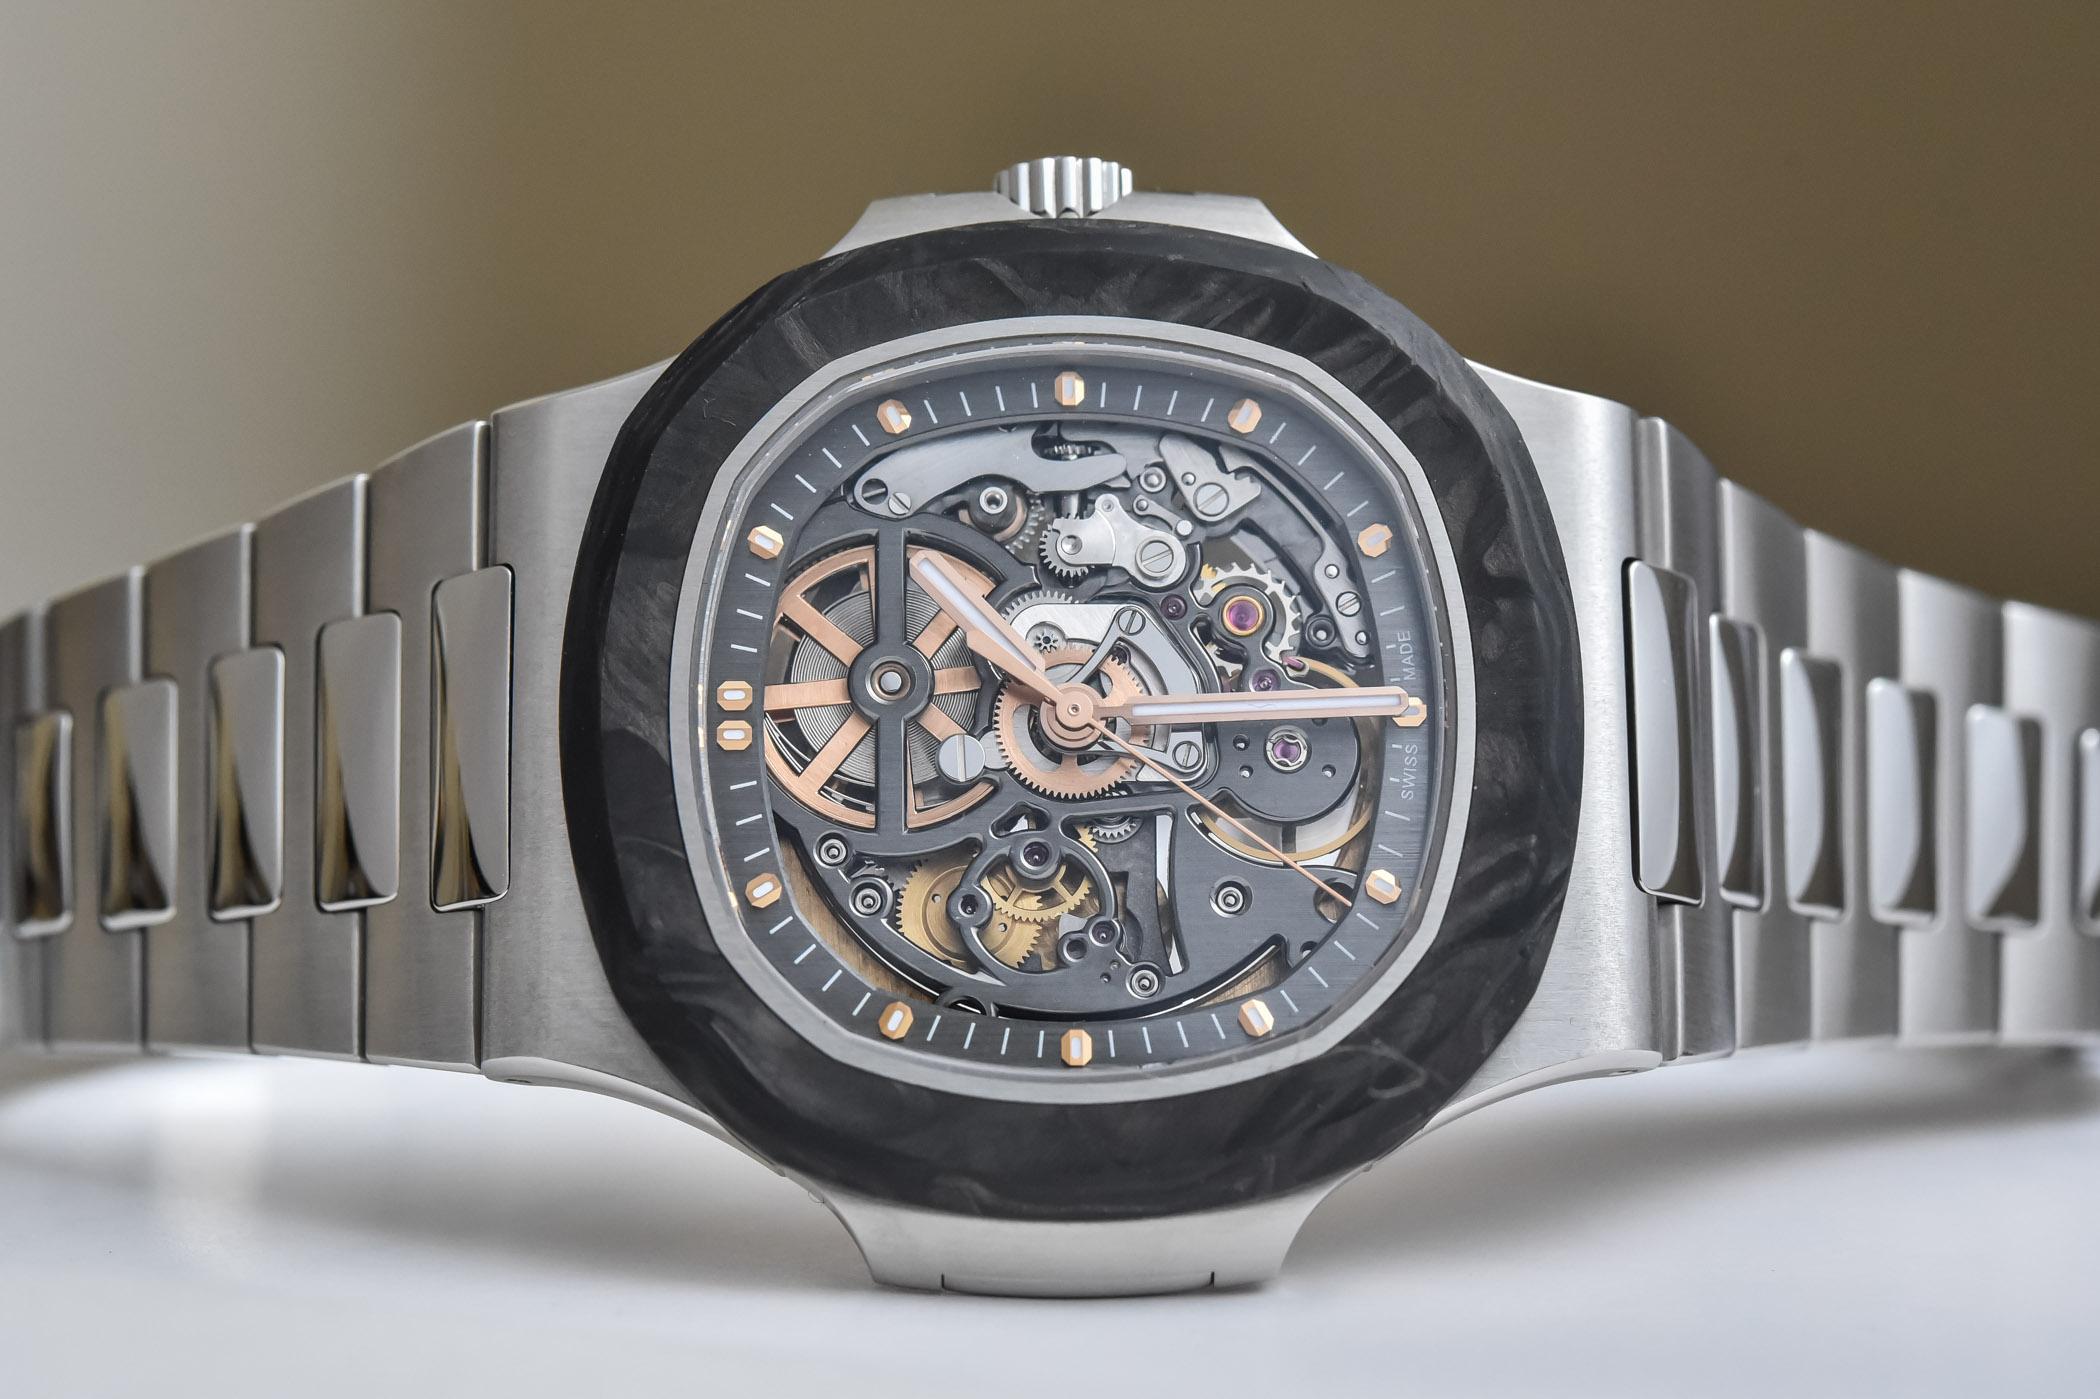 Artisans-de-Genève-The-Pearl-Project-Skeletonised-Patek-philippe-Nautilus-5711-9